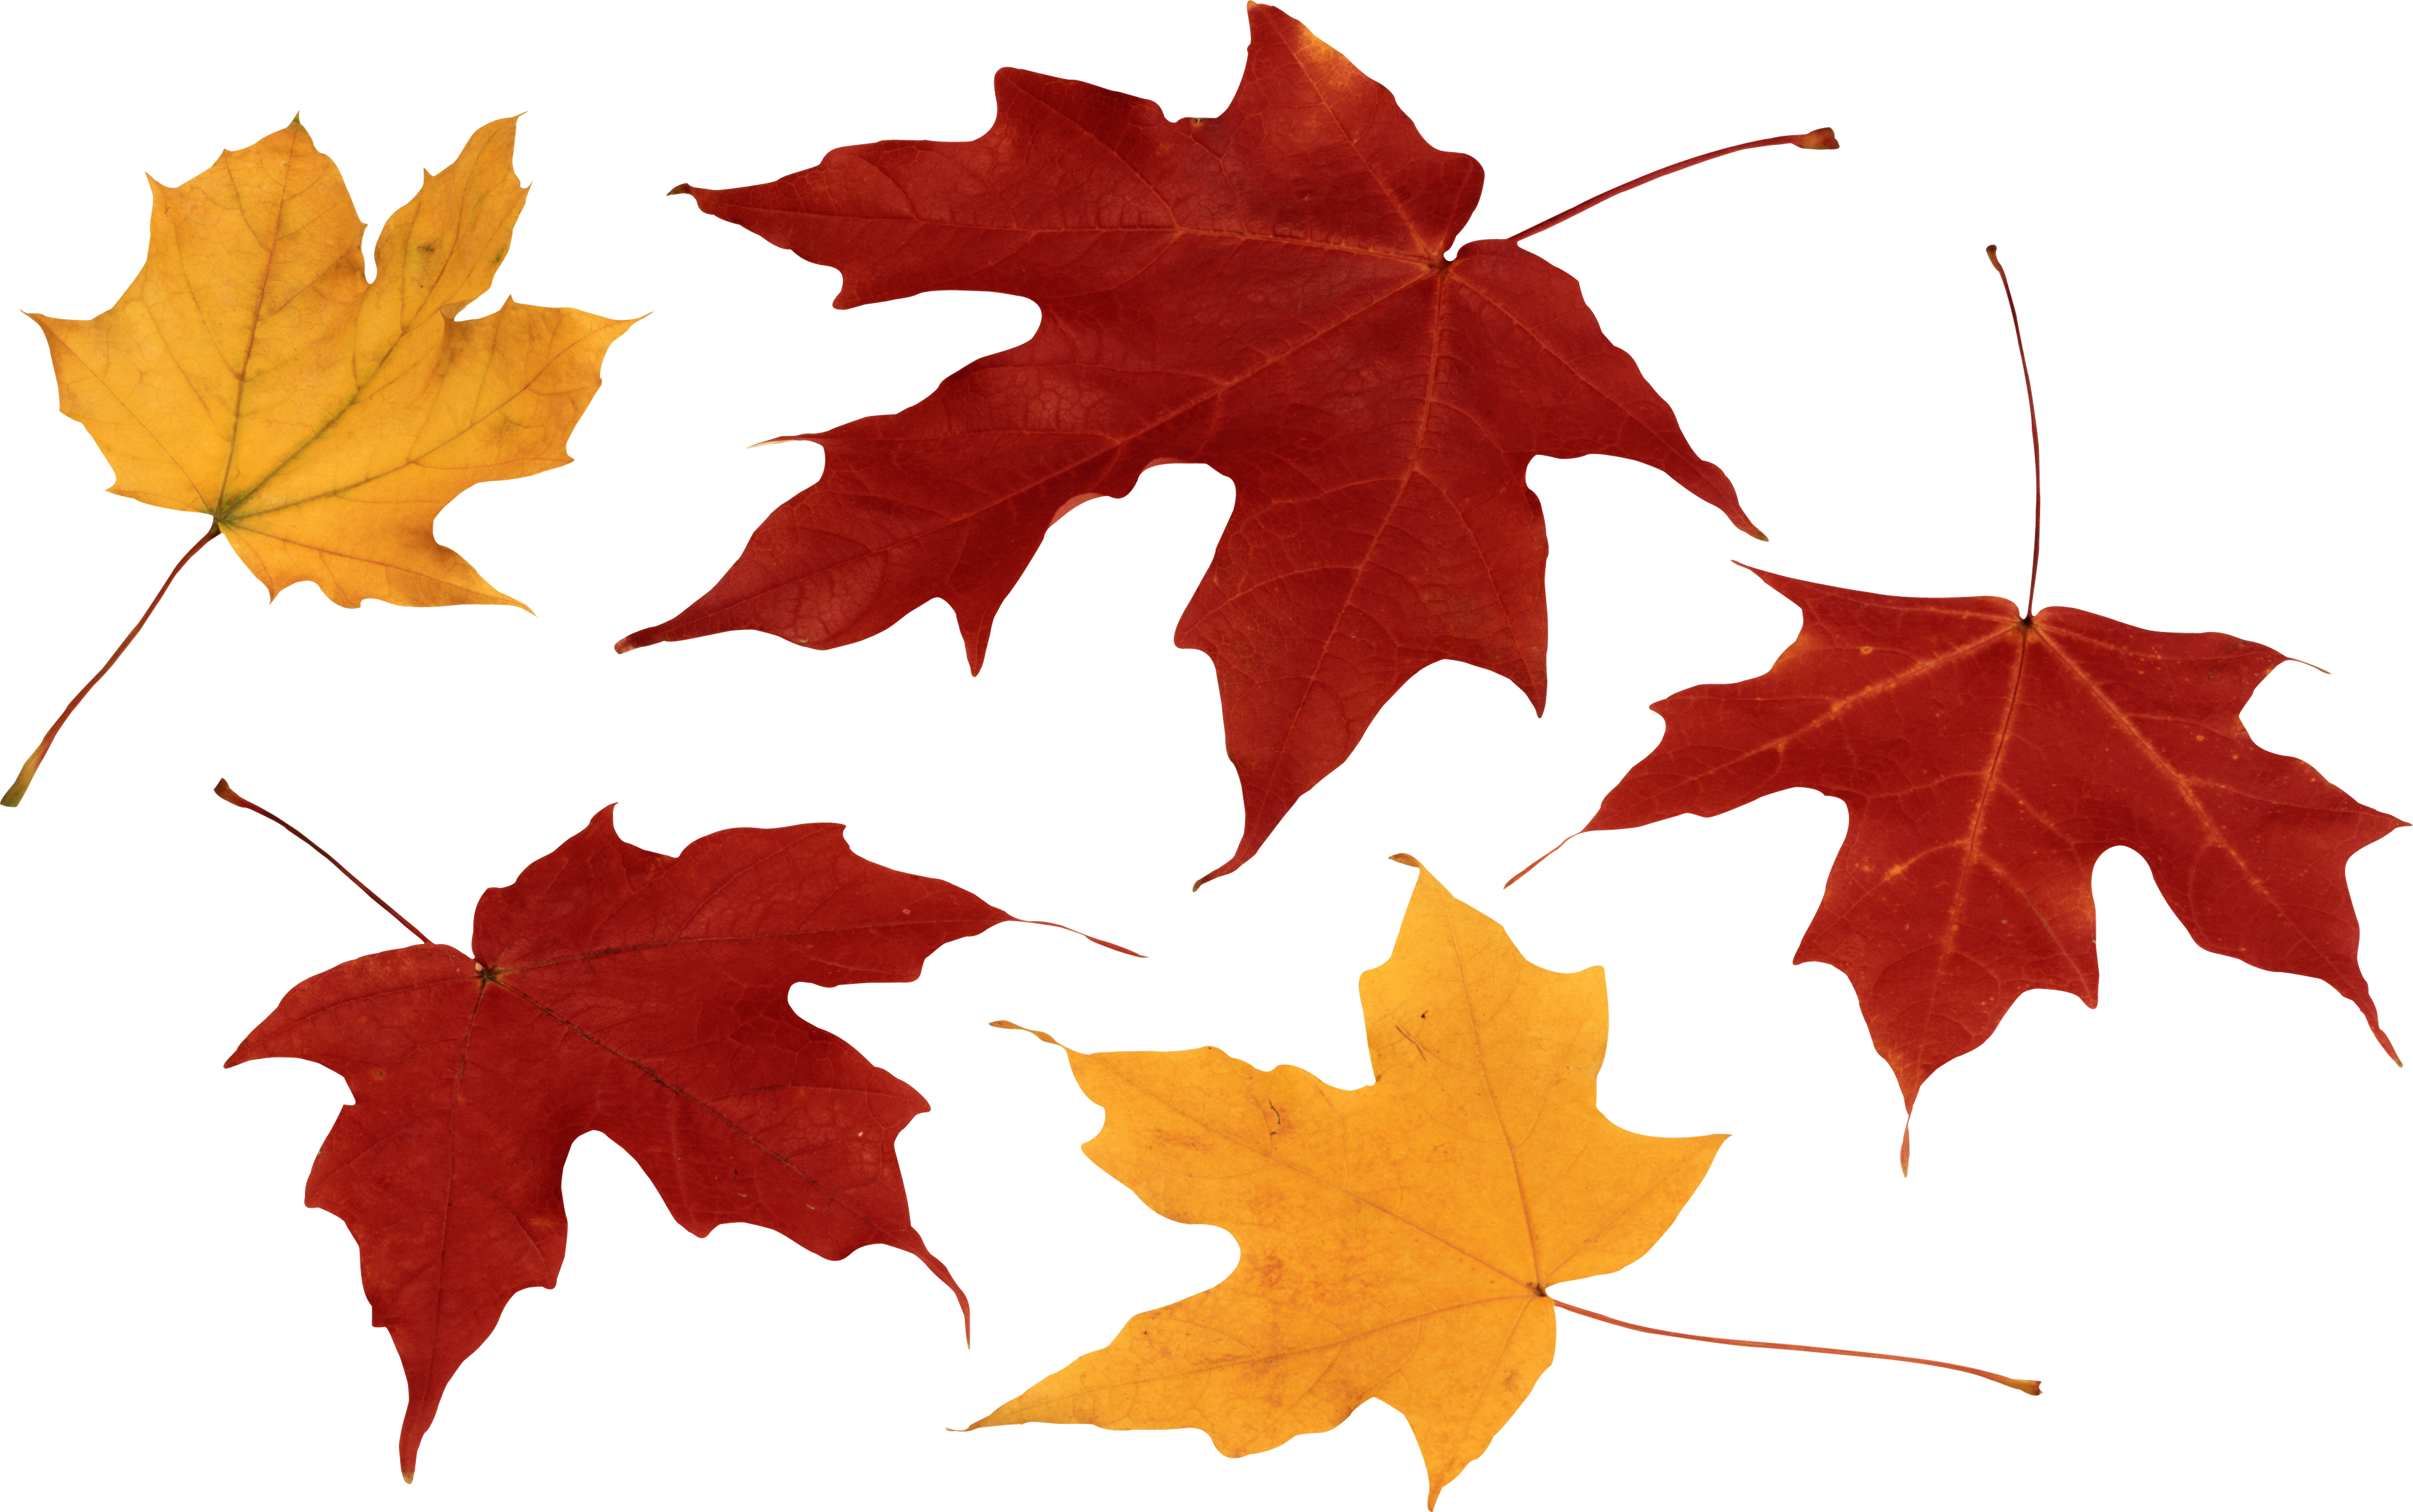 Red Autumn Leaf PNG Image - PurePNG | Free transparent CC0 PNG Image ...